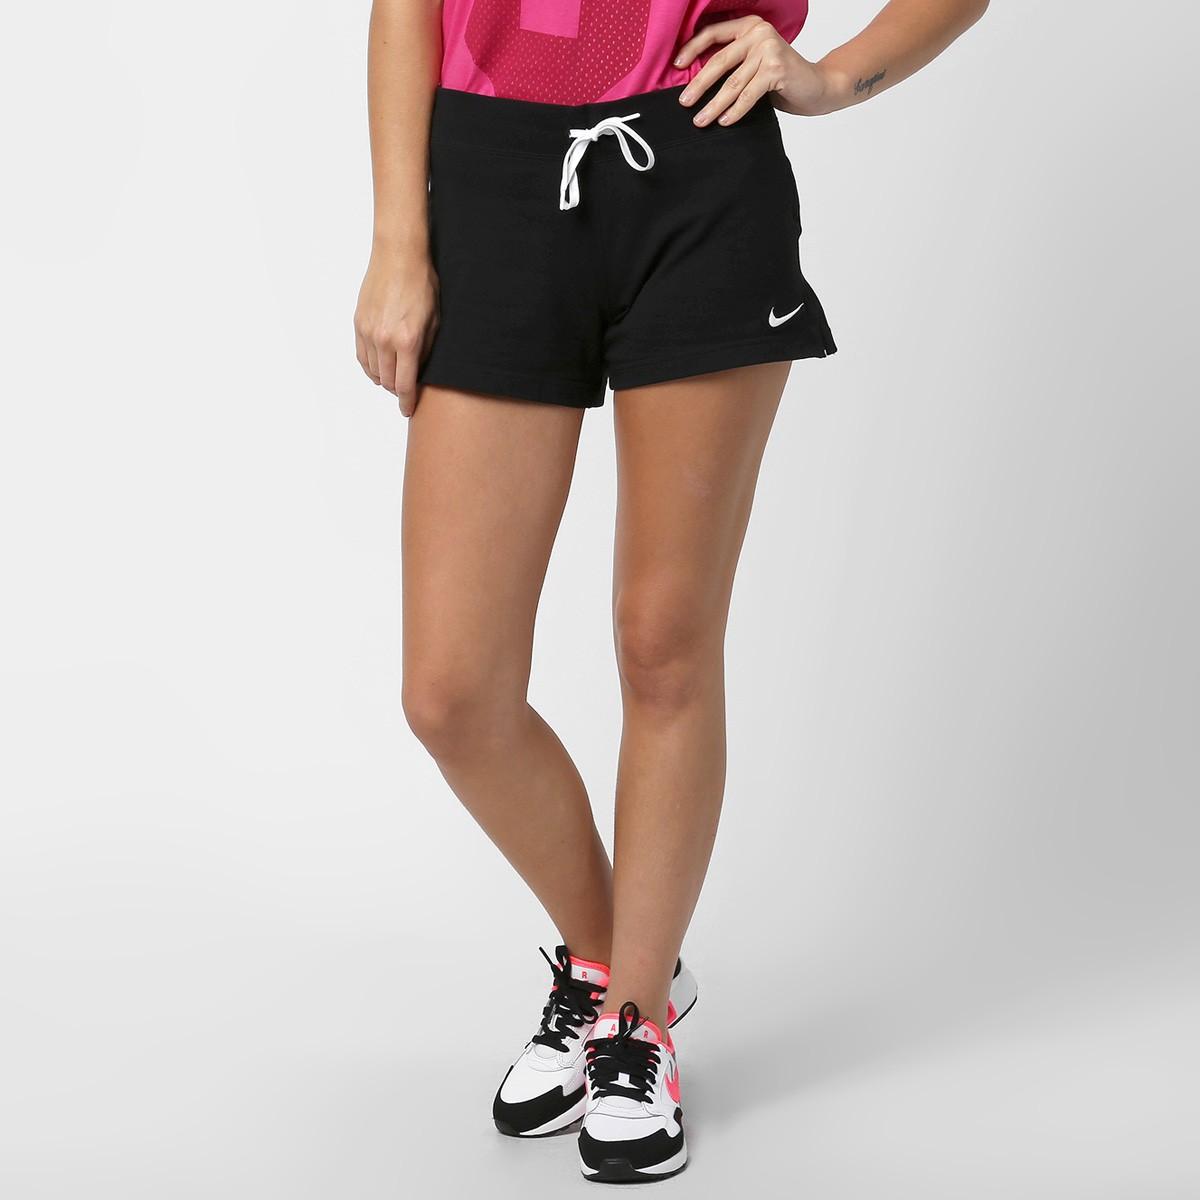 Short Feminino Nike Jersey Short 615055-010 - Preto Branco ... 258e1fdcbc70e